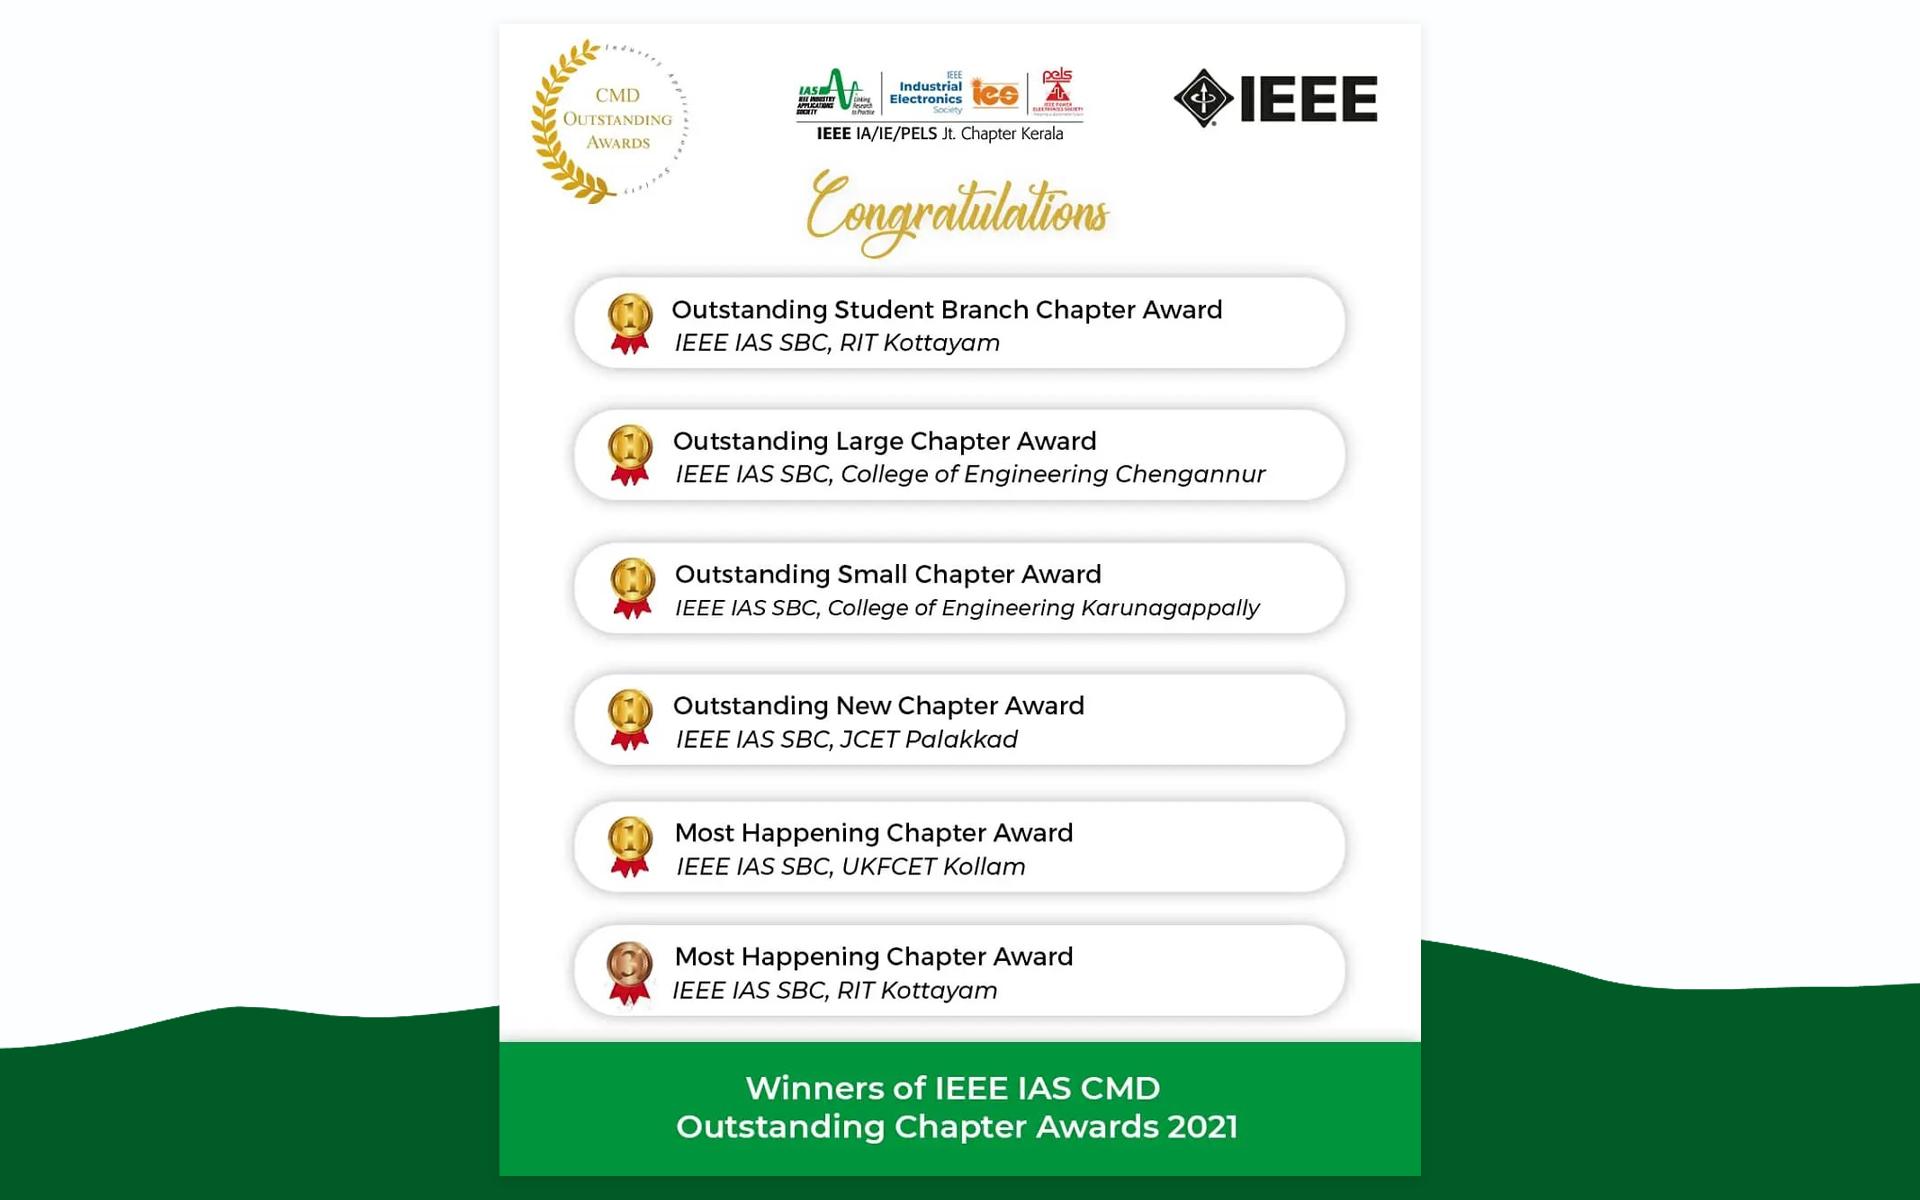 IAS cmd winners